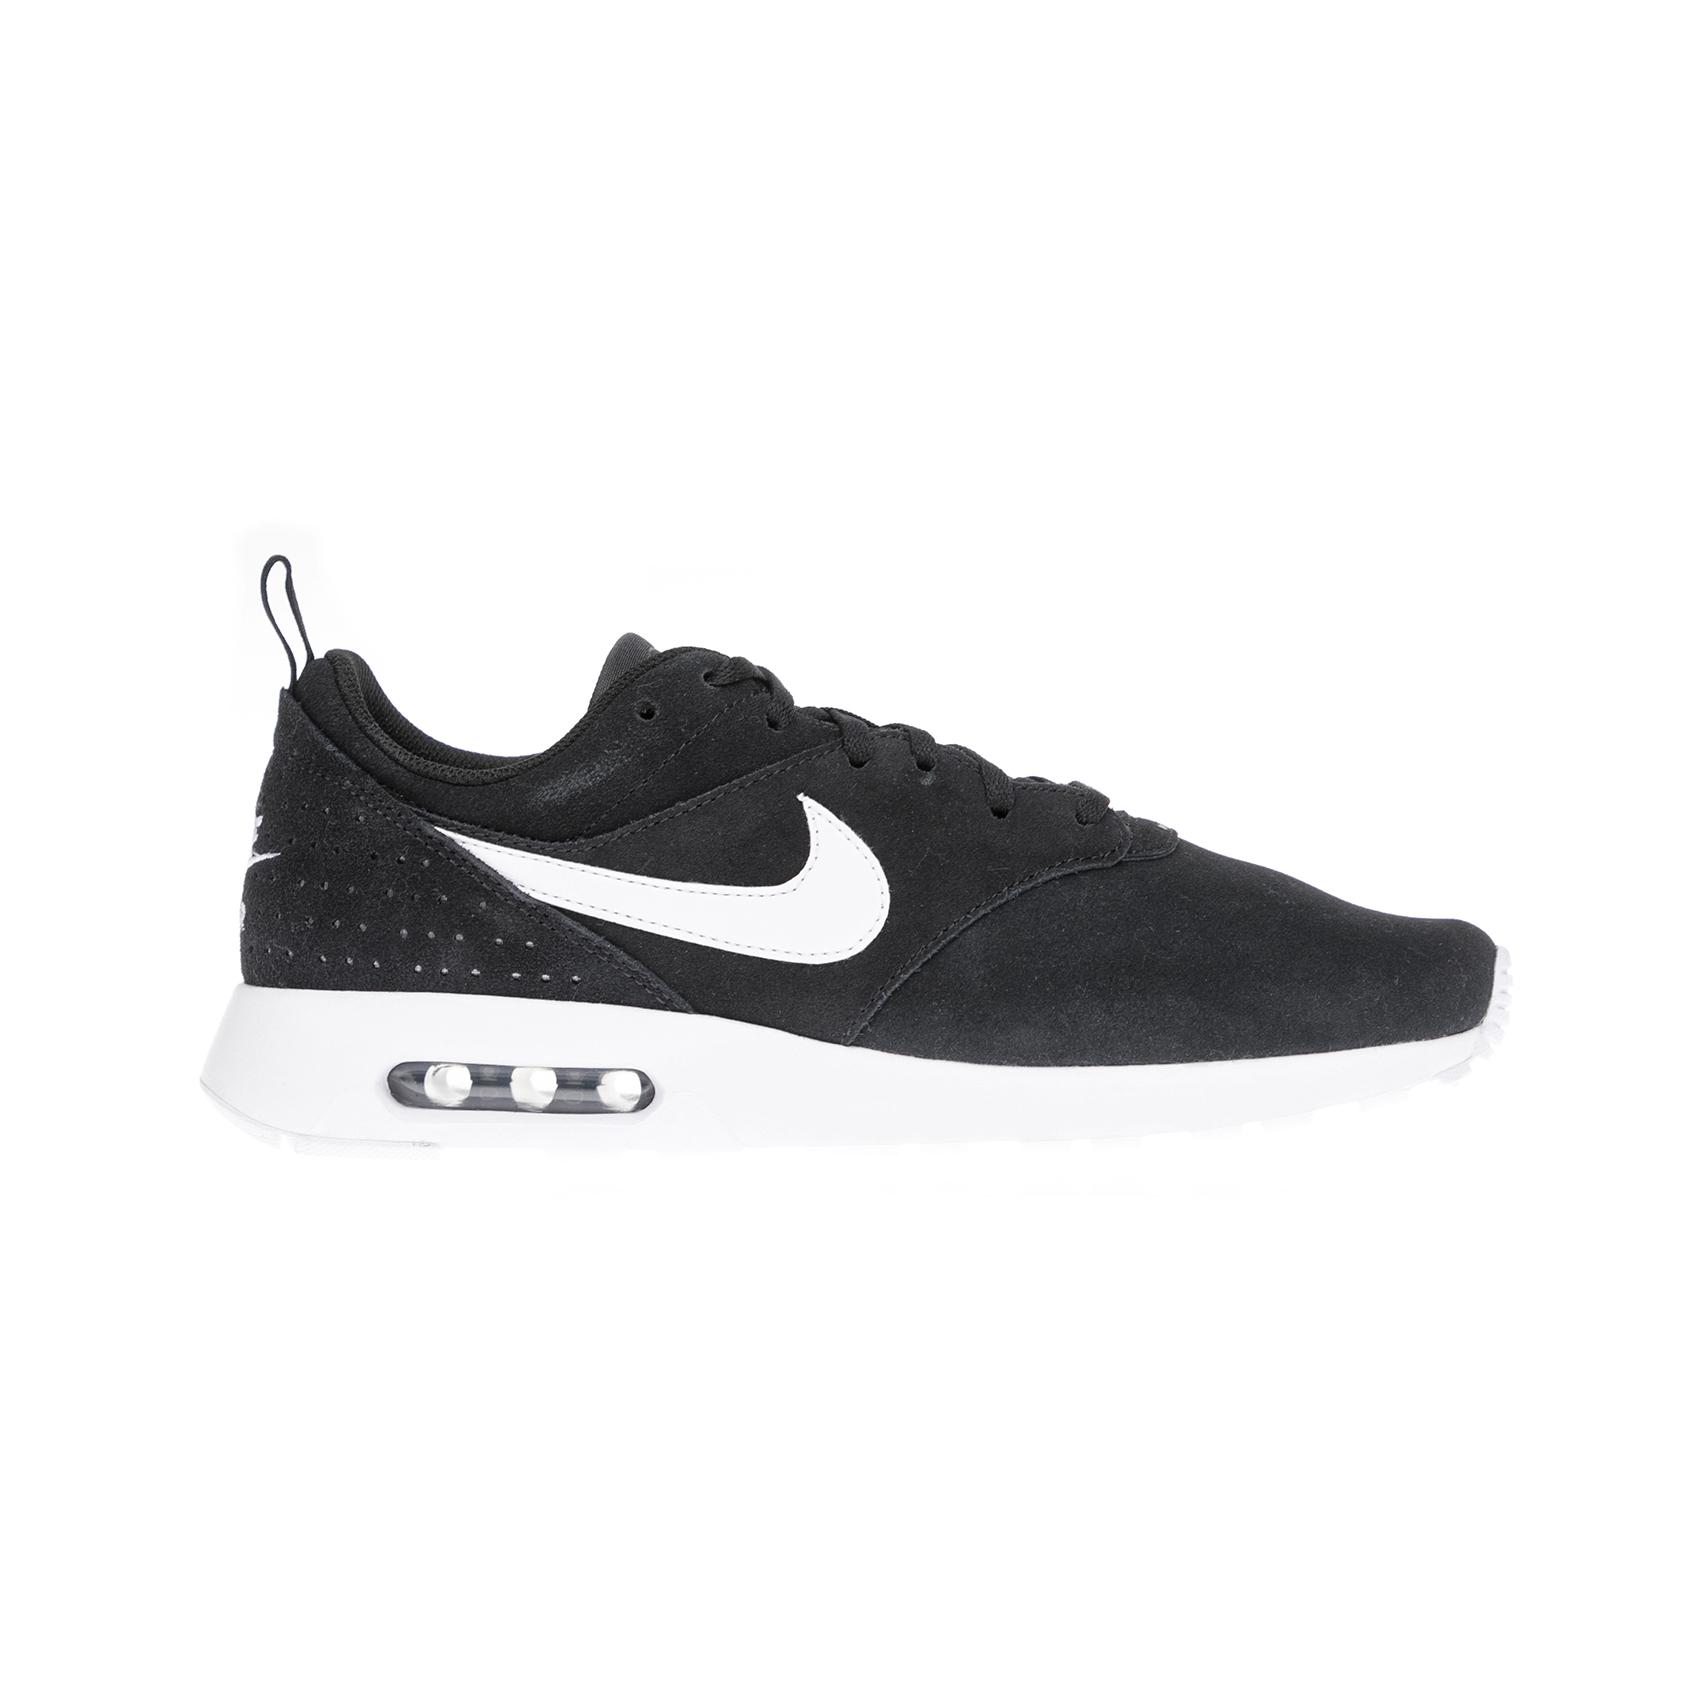 NIKE – Αντρικά παπούτσια NIKE AIR MAX TAVAS LTR μαύρα